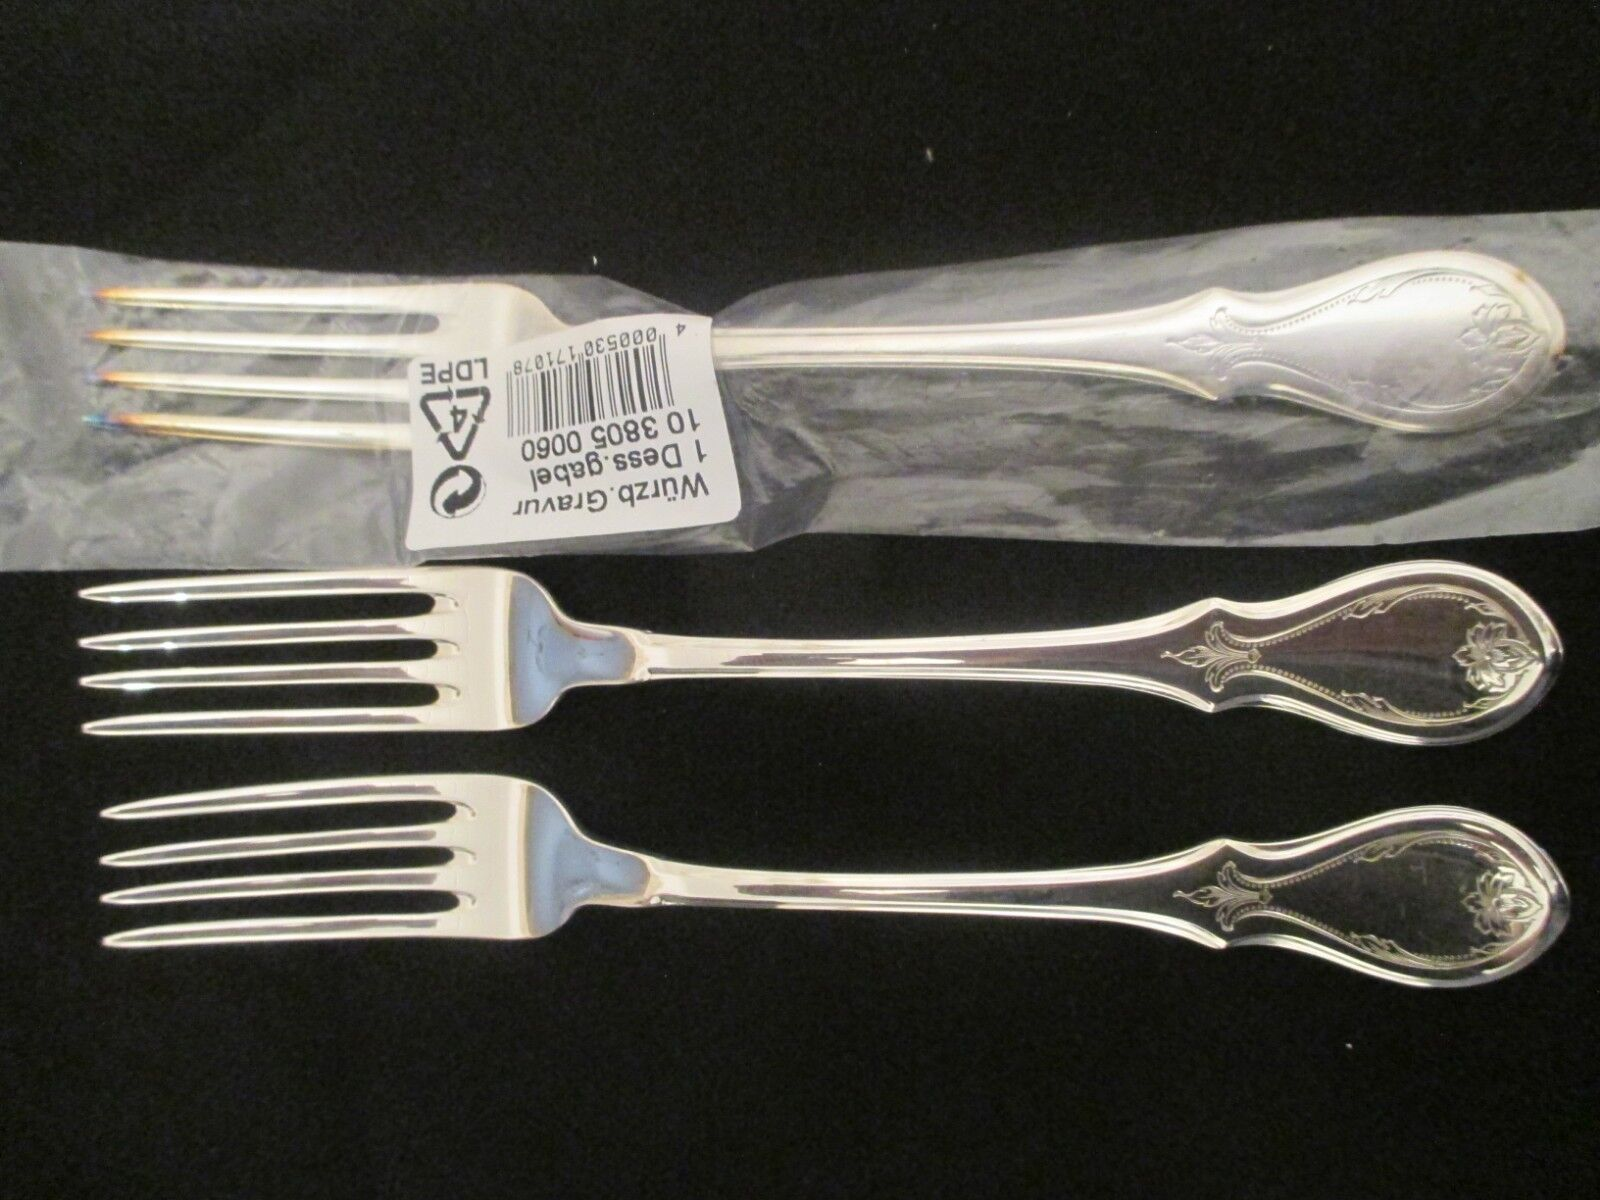 WMF Würzburger Gravur 90 90 90 Silber 3 Dessertgabel 18,3 cm Vorspeisegabel Gabel TOP   Online-verkauf  a7c2bb